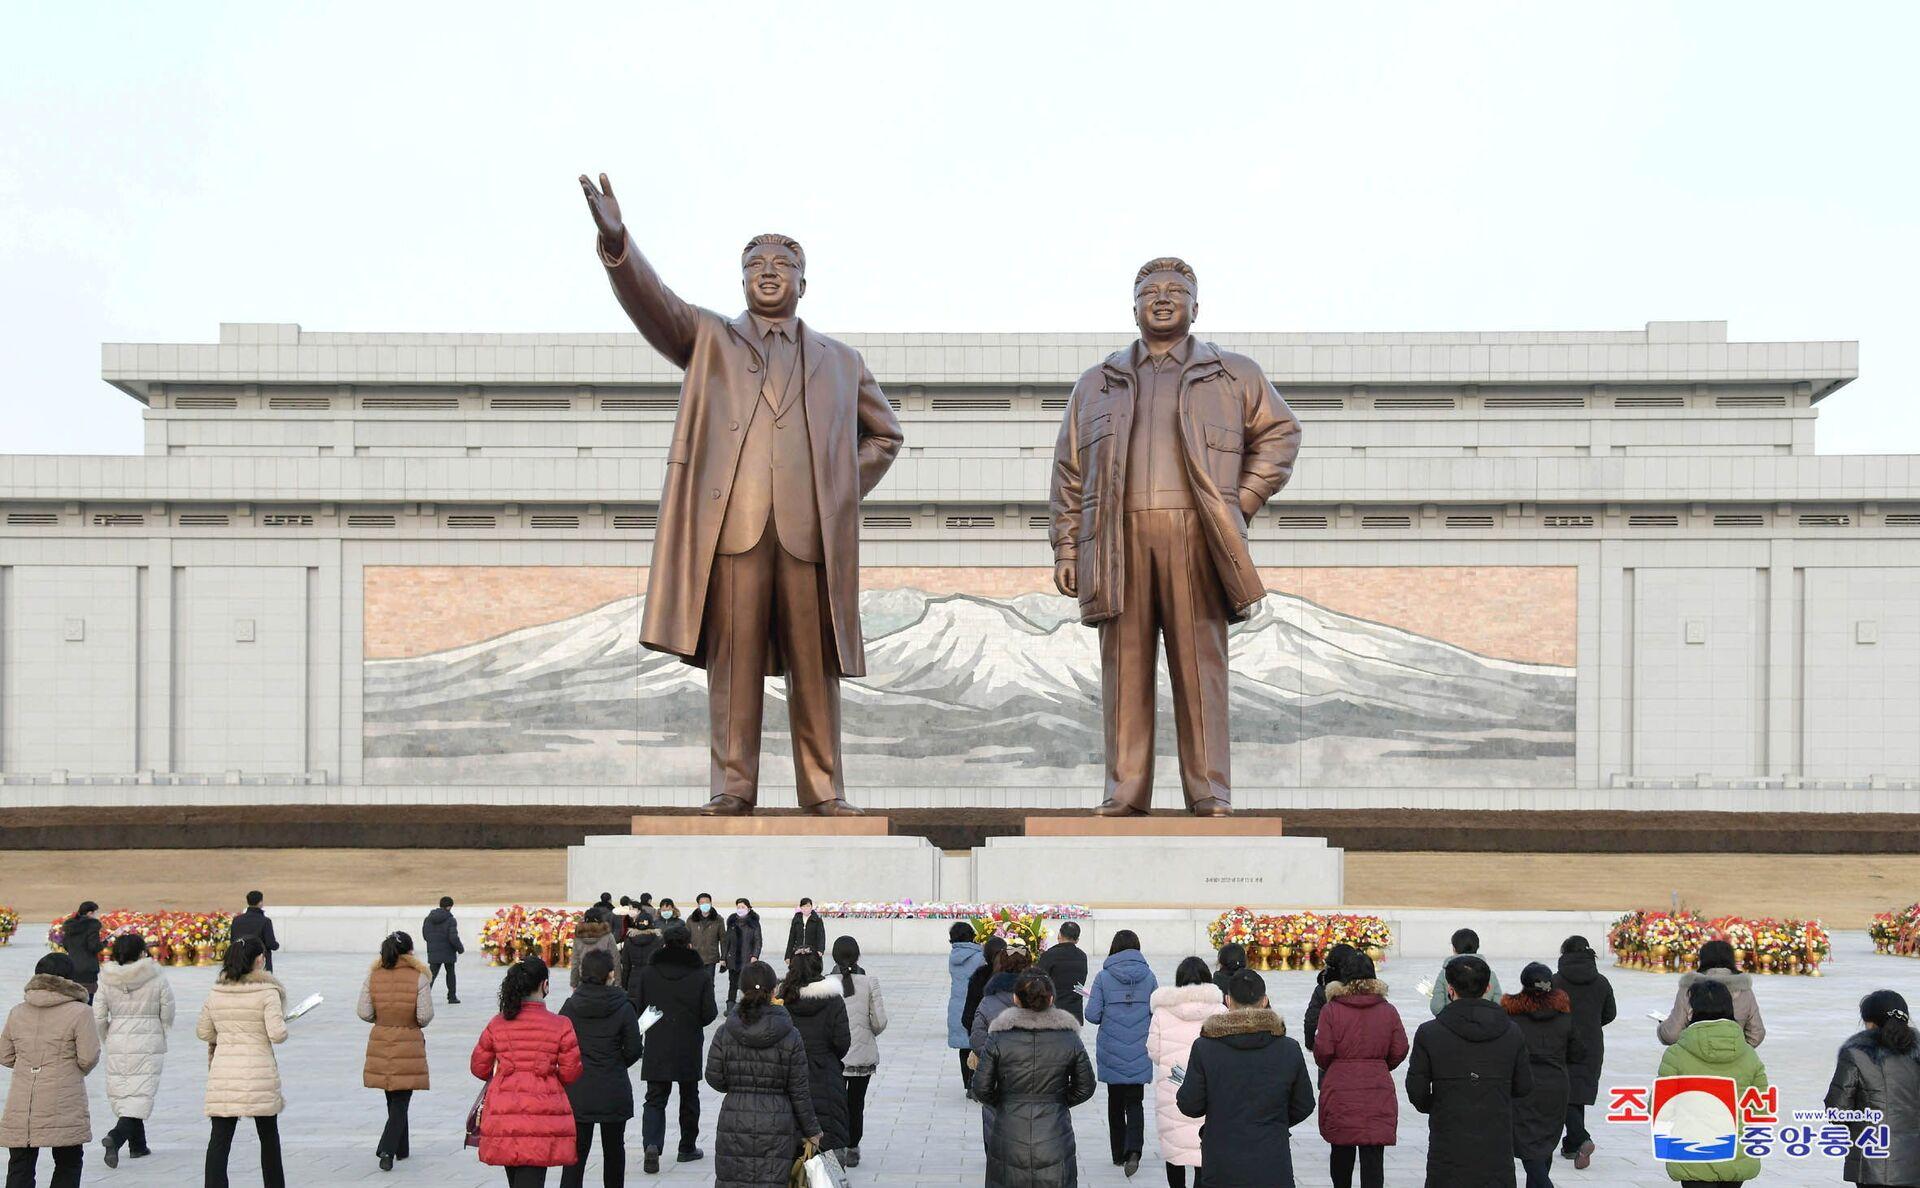 Defector Says 'Even North Korea Is Not This Nuts' After Graduating From Prestigious US University - Sputnik International, 1920, 15.06.2021